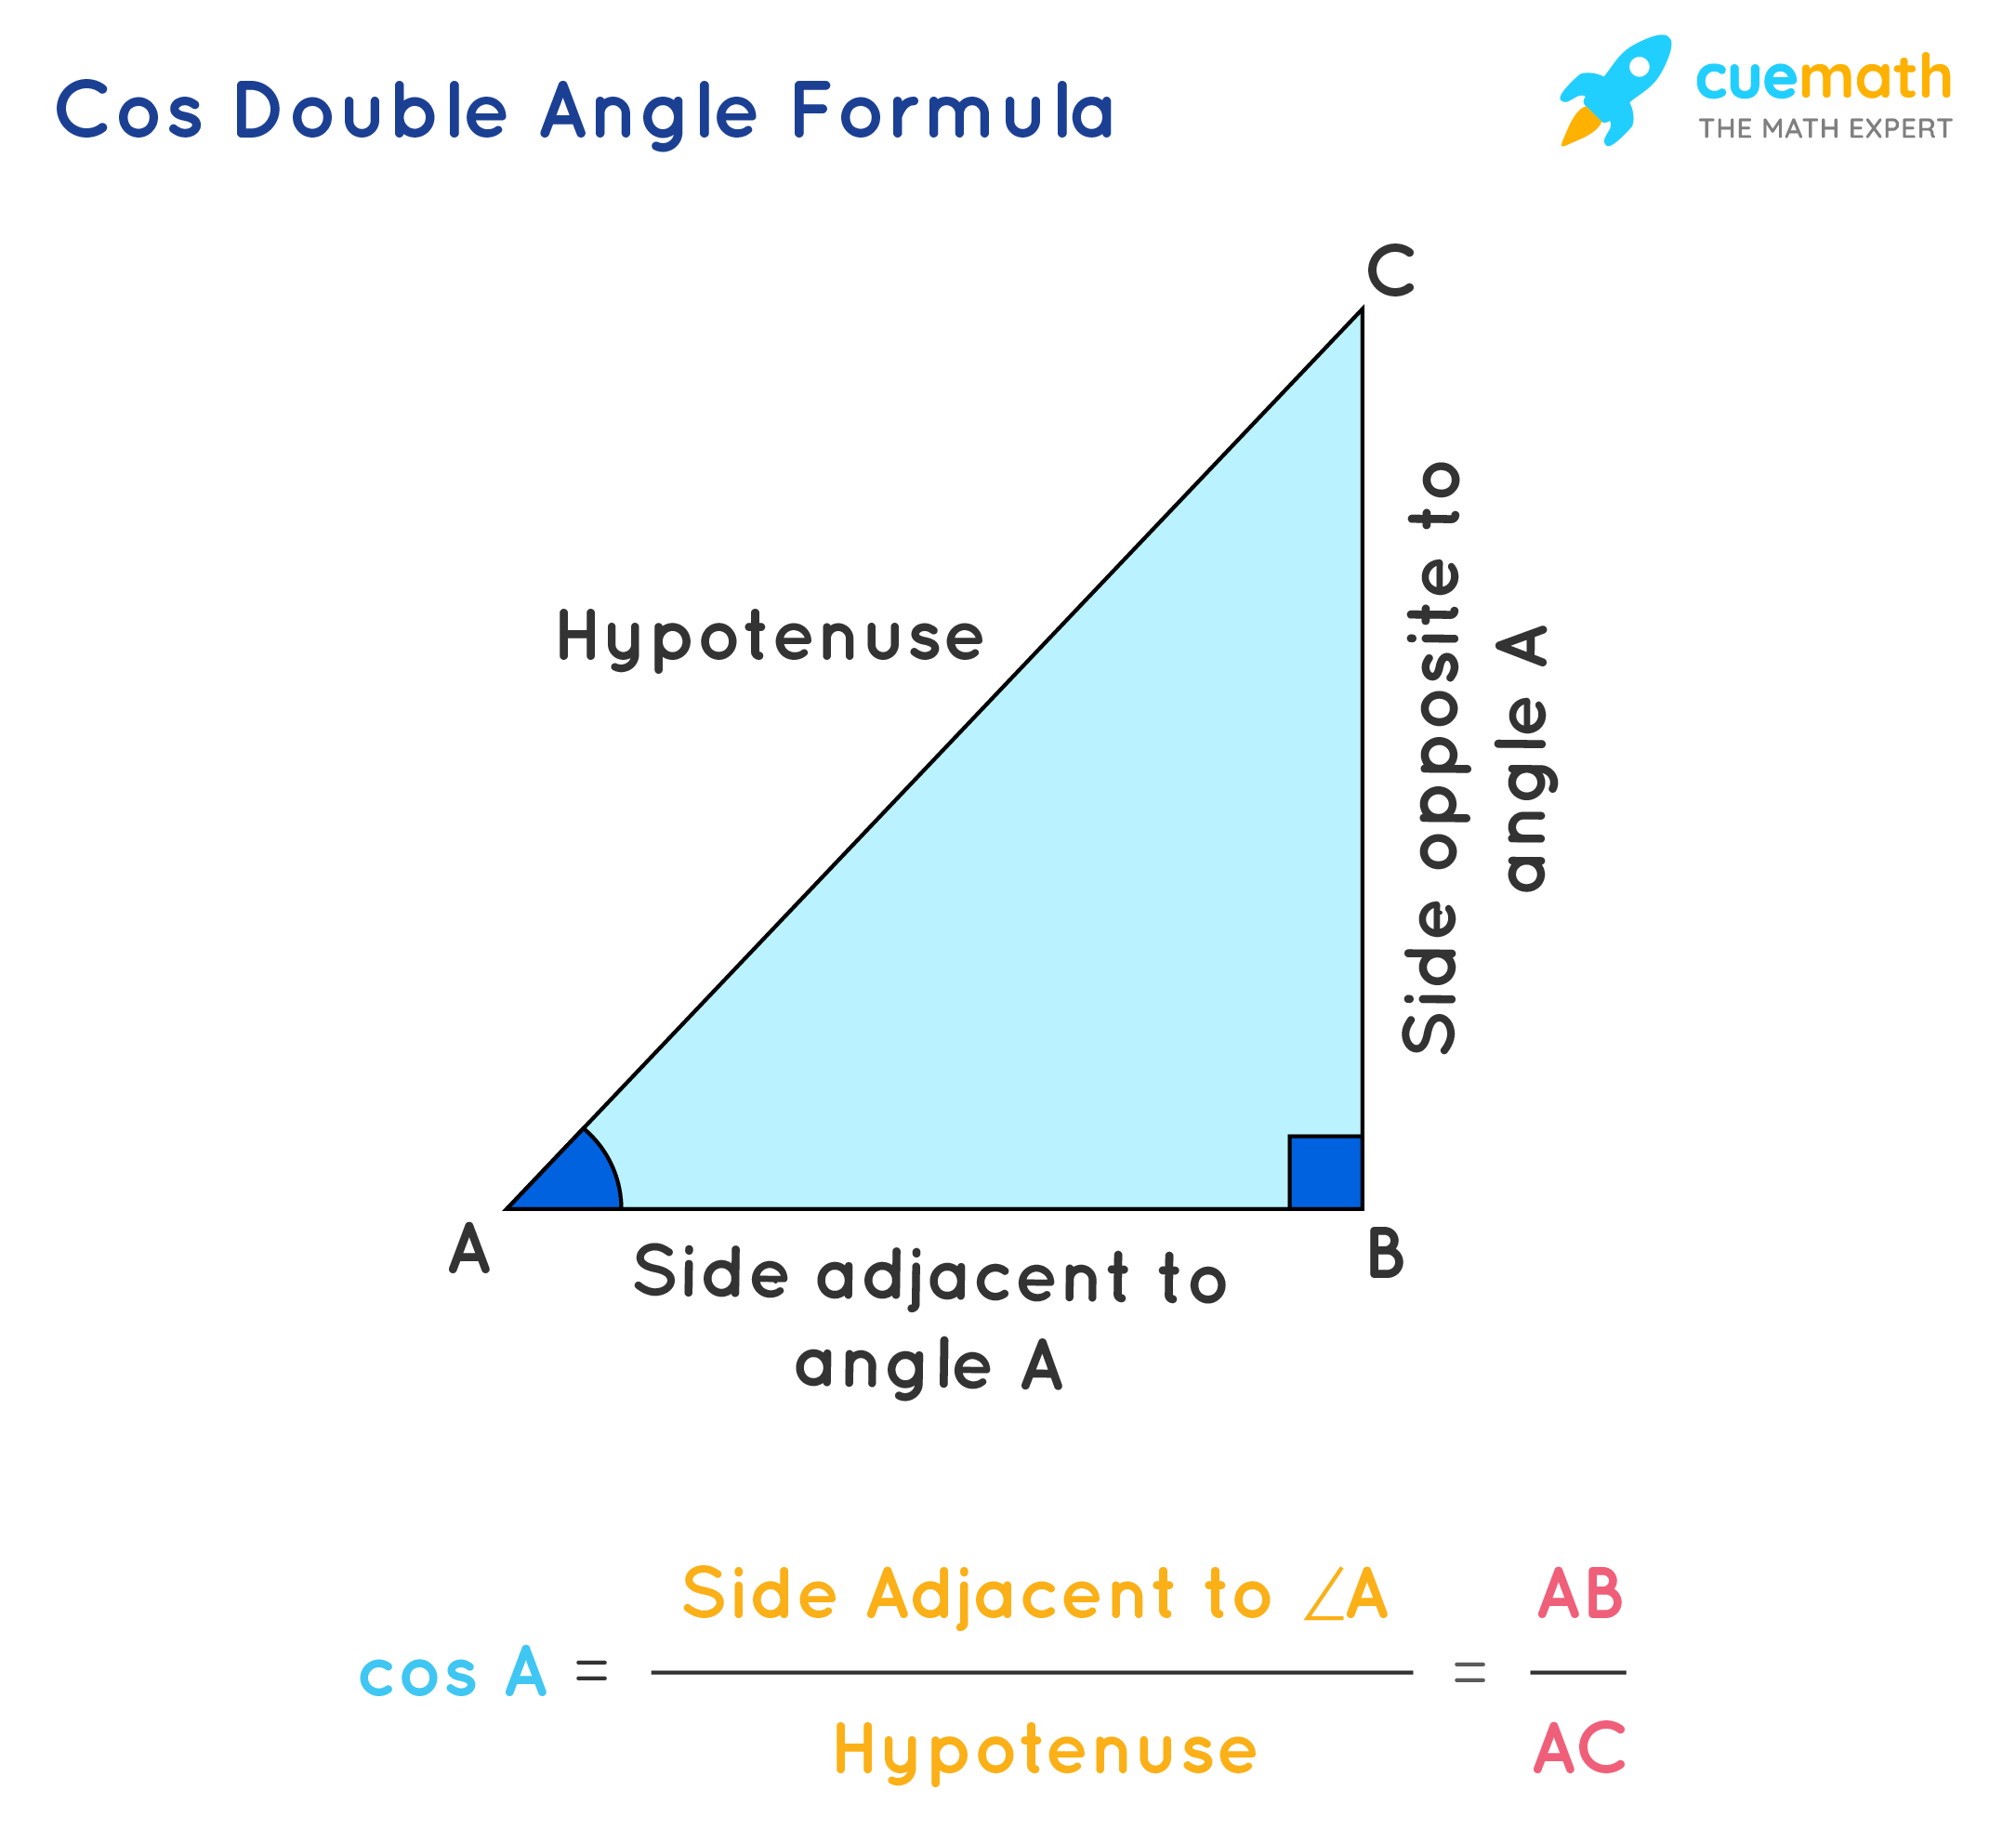 Cos Double Angle Formula